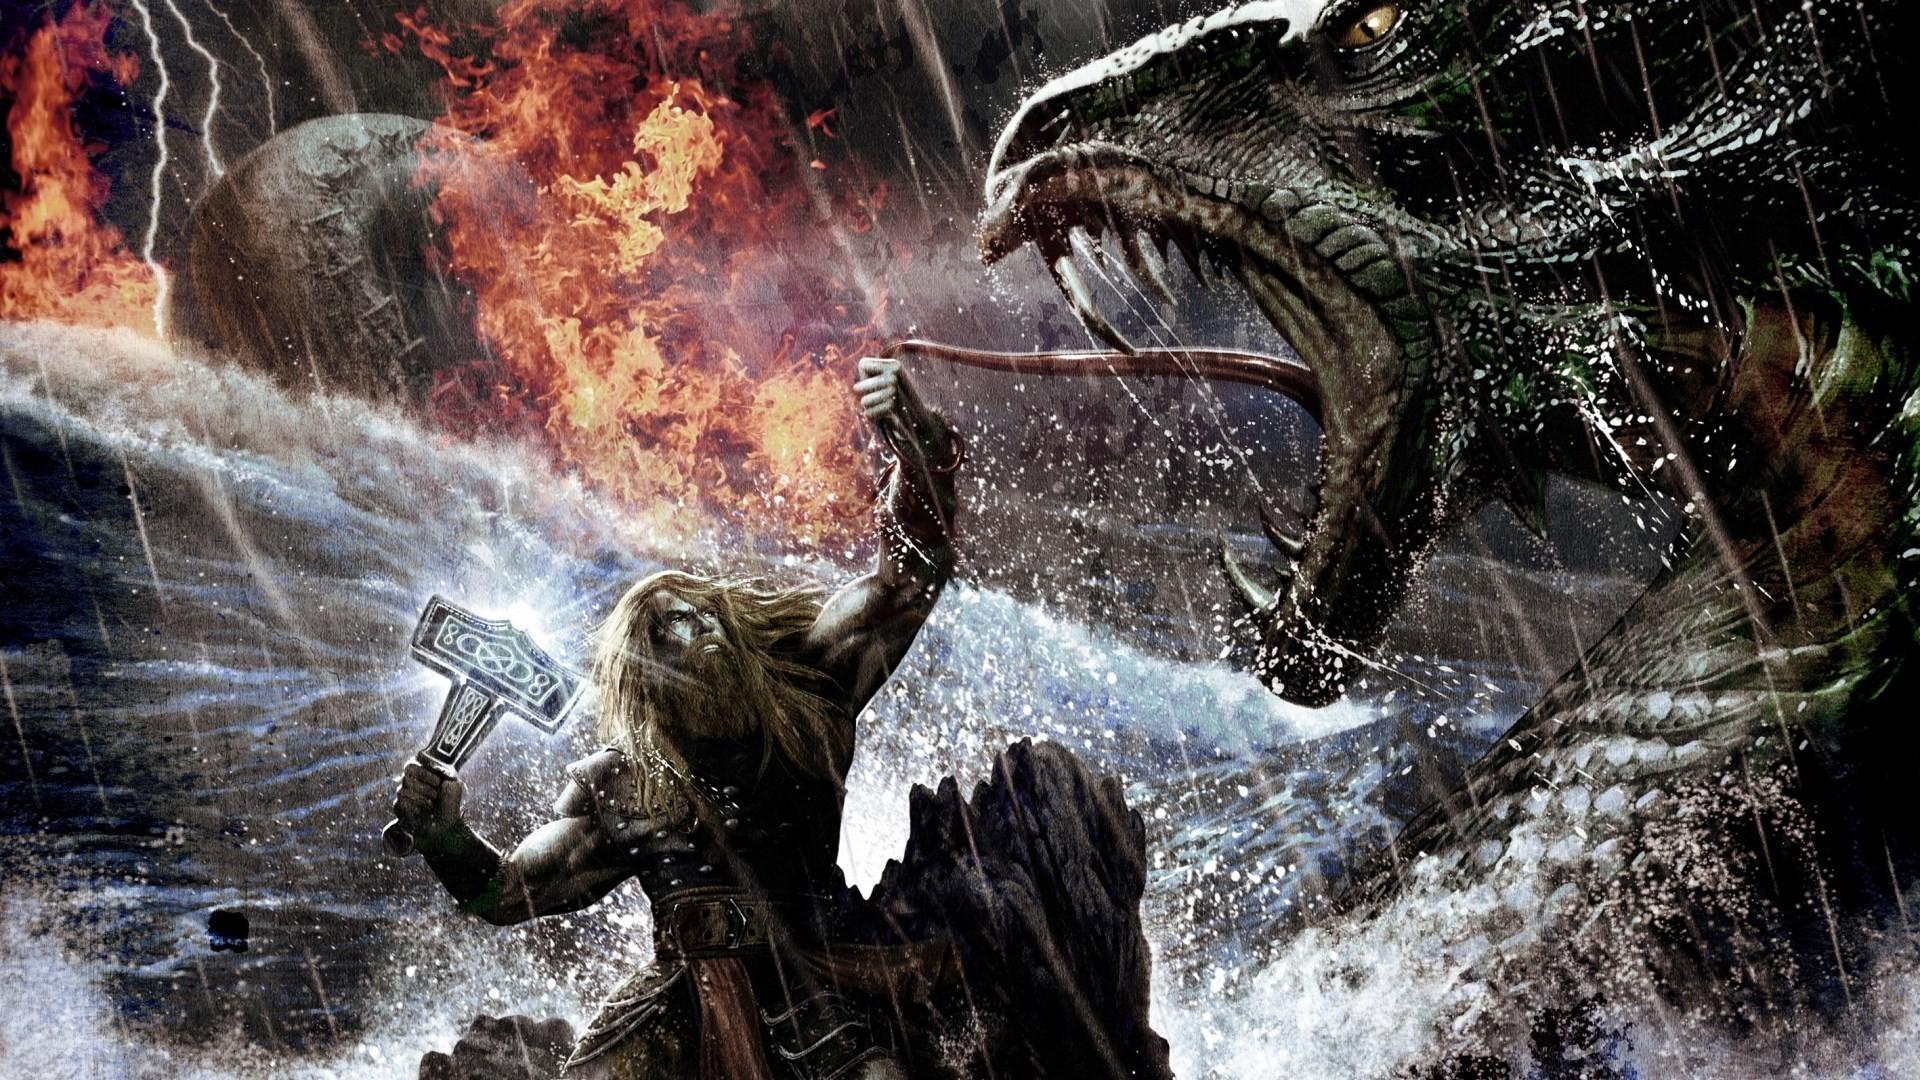 General 1920x1080 Amon Amarth melodic death metal battle warrior Fantasy Battle digital art fantasy art medieval Thor Mjolnir music cover art album covers rock bands extreme metal